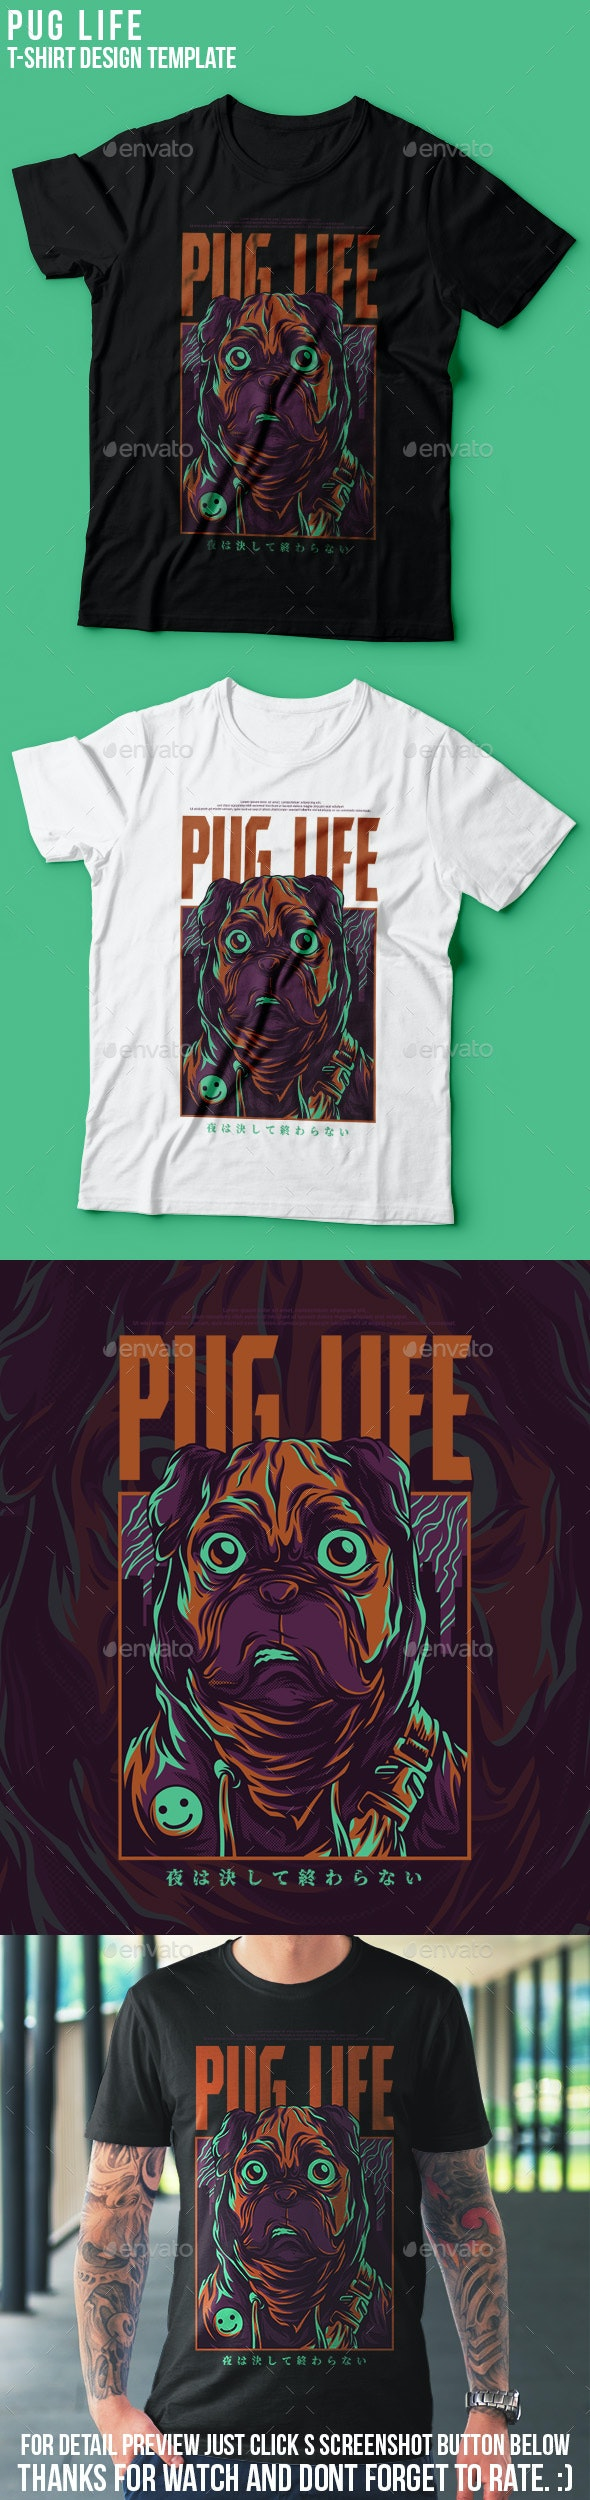 Pug Life T-Shirt Design - Funny Designs